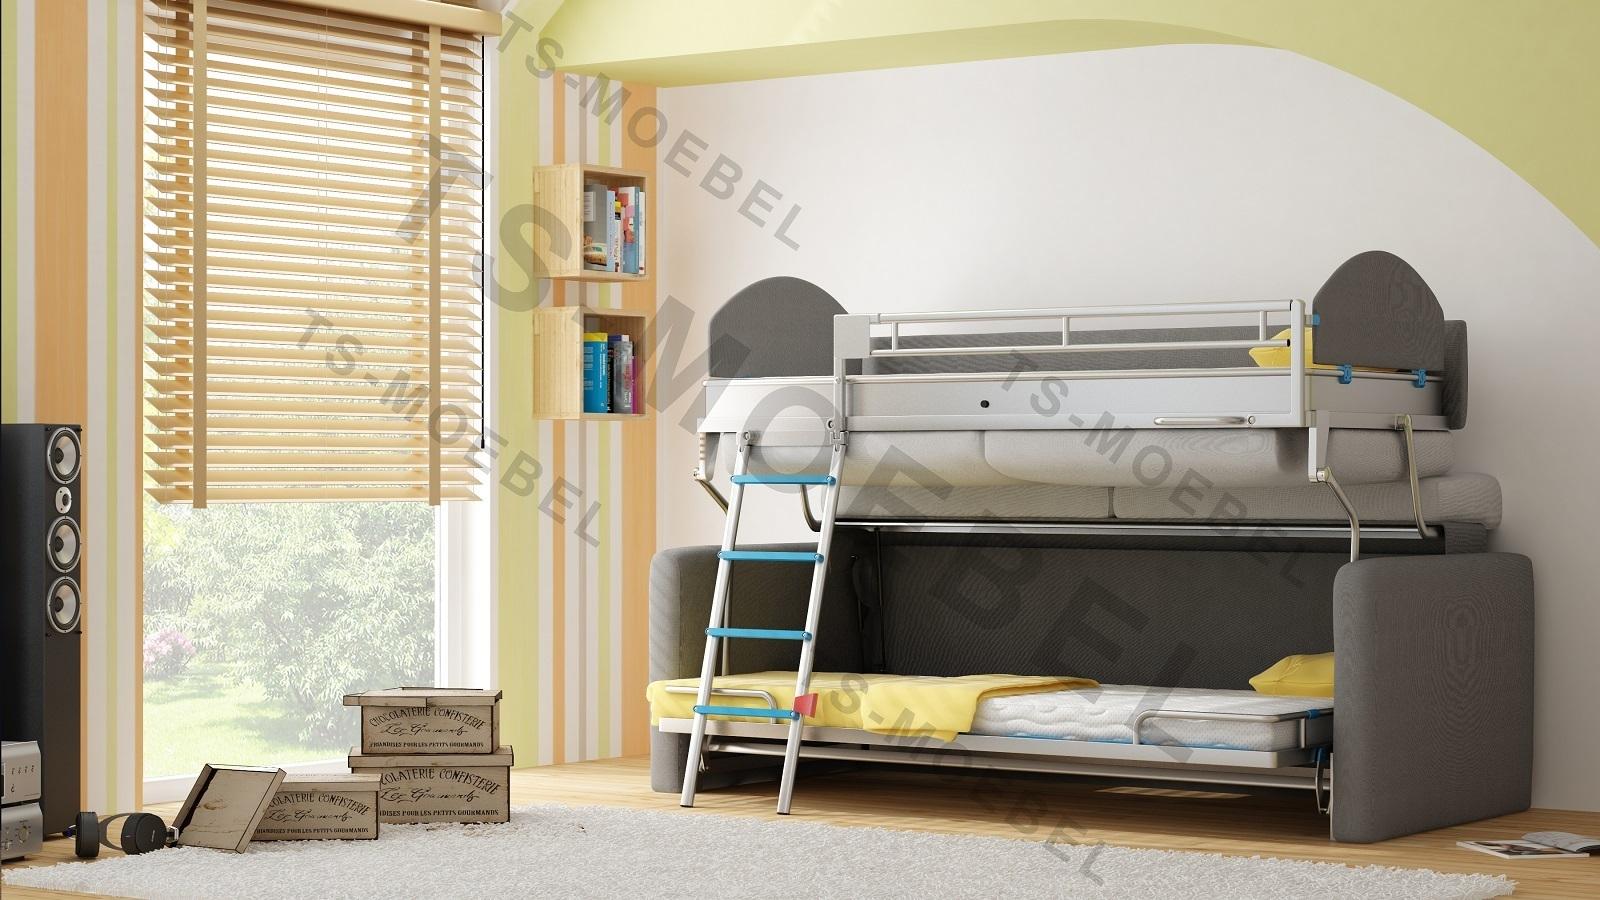 Etagenbett Schutz : Etagenbett stian cm eiche weiß kinderbett hochbett